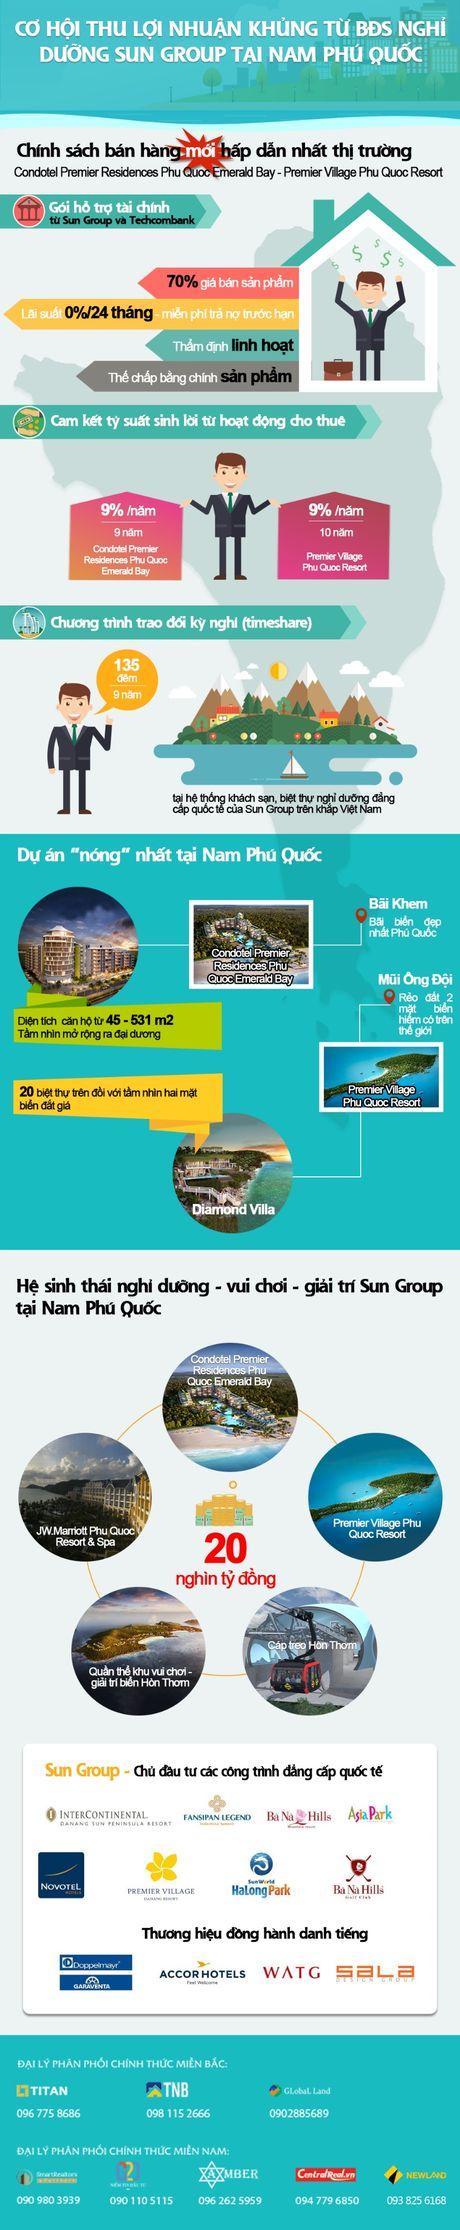 Ho tro tai chinh lon khi dau tu BDS nghi duong Nam Phu Quoc - Anh 1